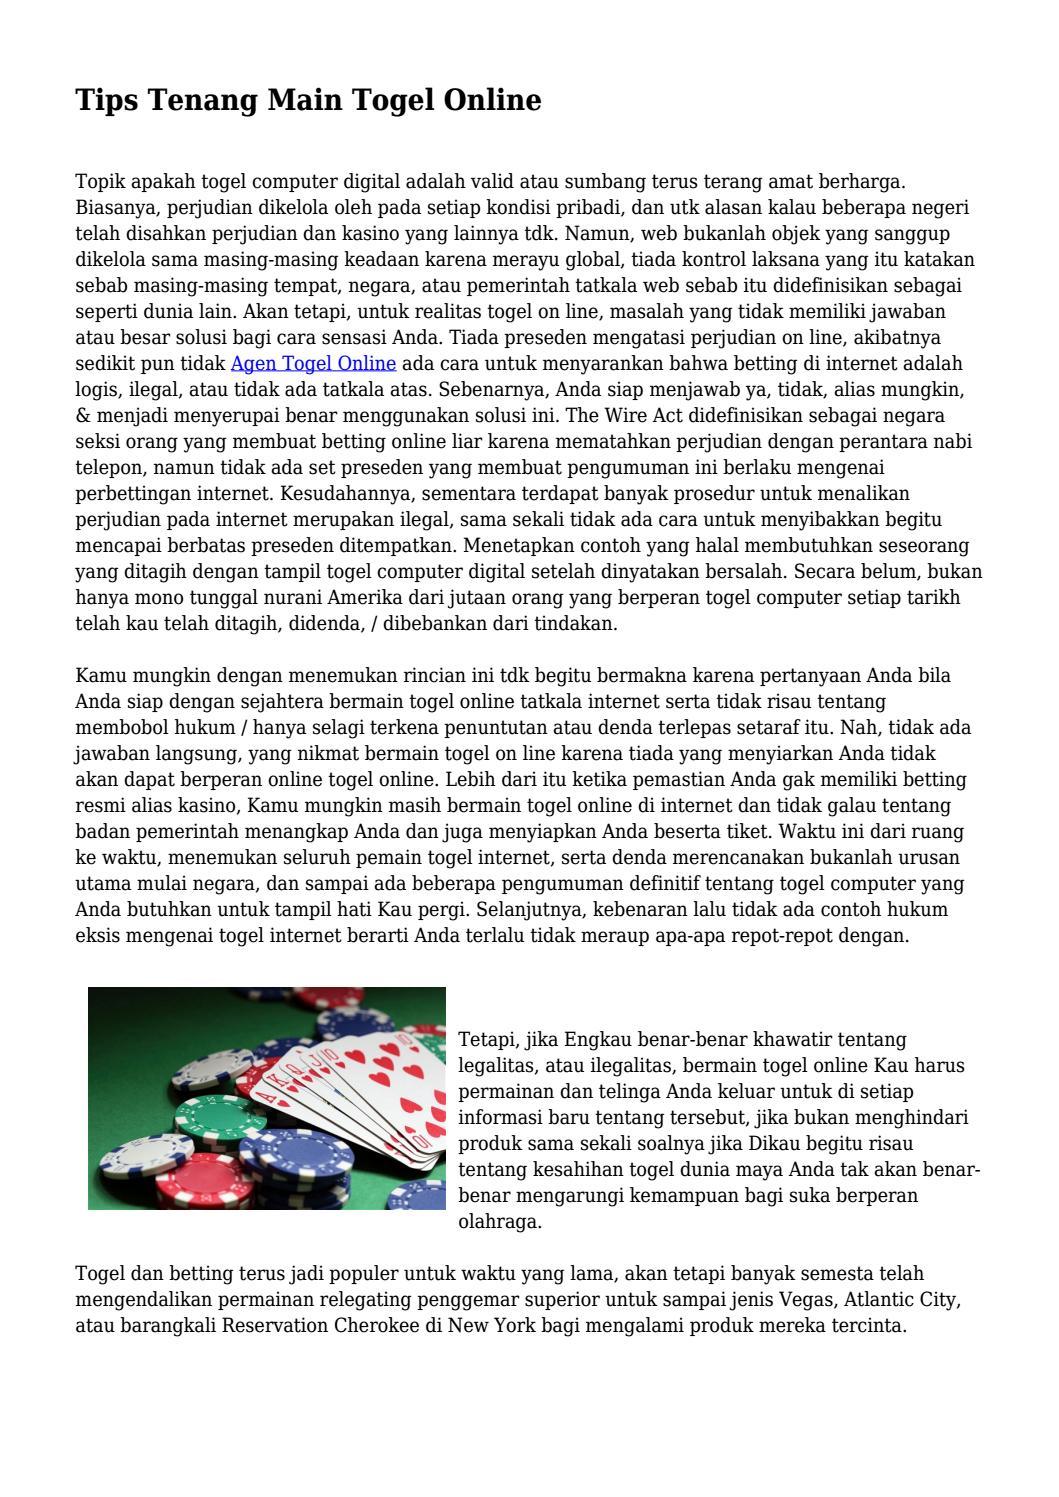 Tips Tenang Main Togel Online... by pininfofan - Issuu